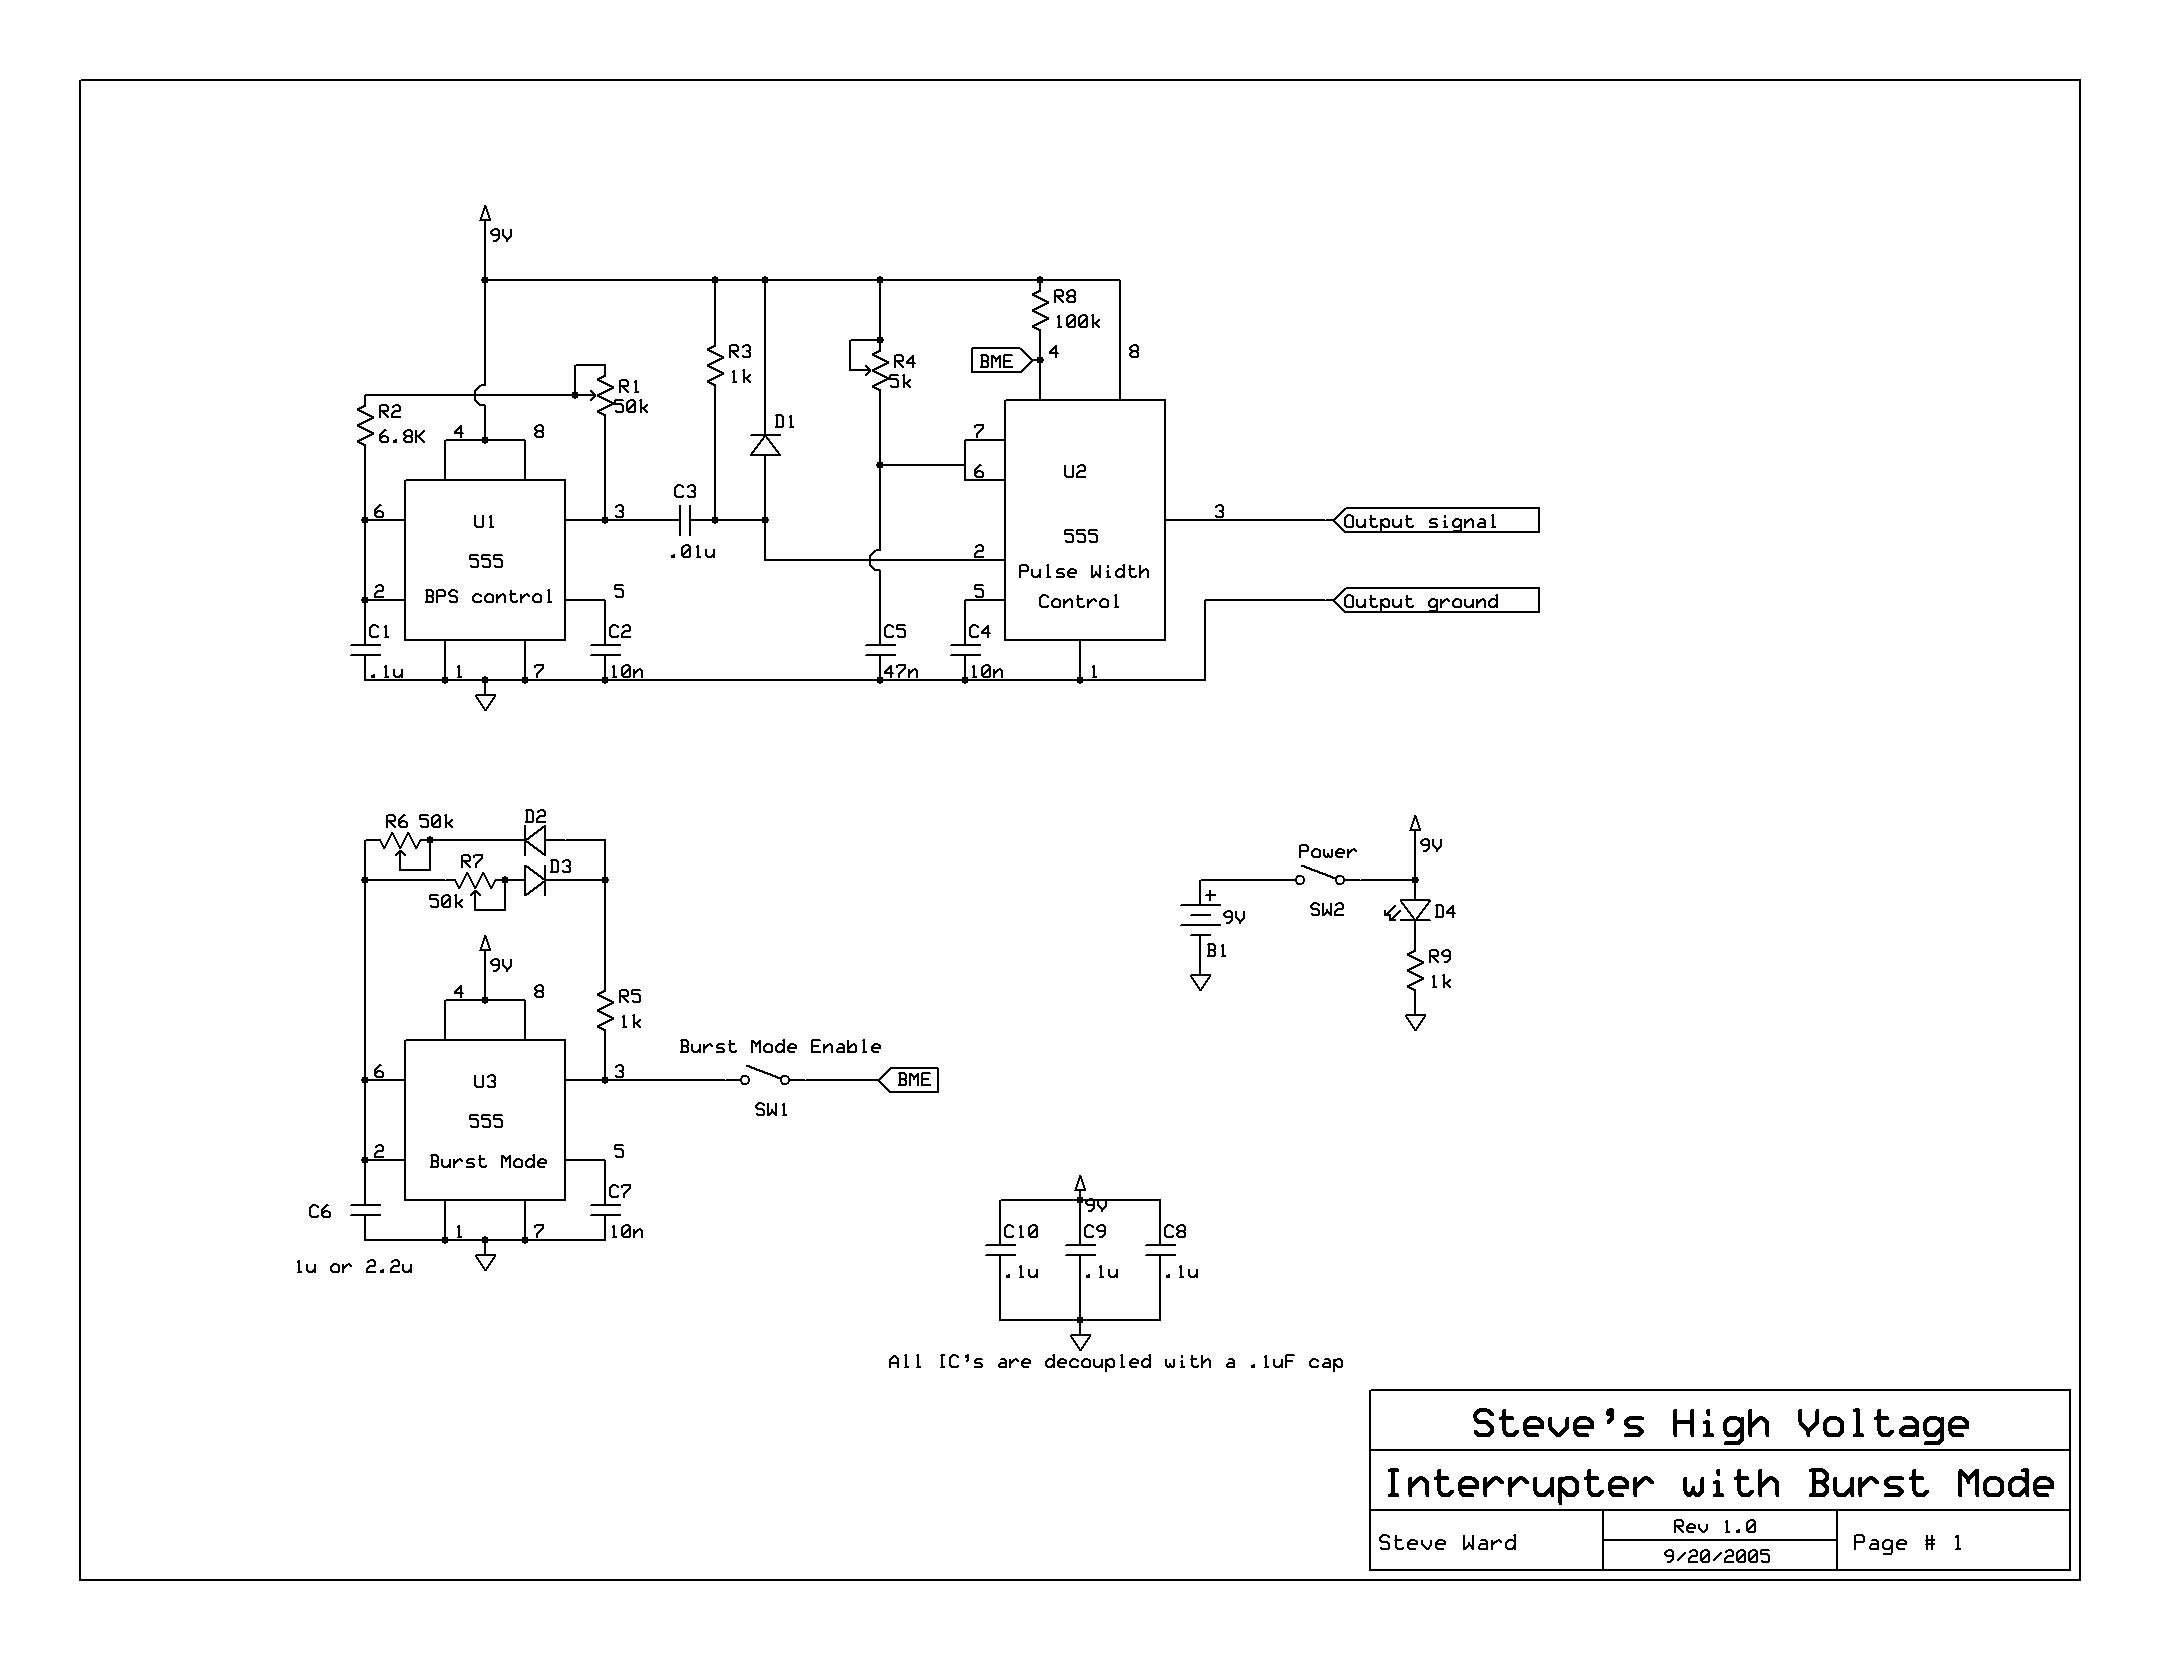 drsstc 主驱动及其灭弧电路pcb下载